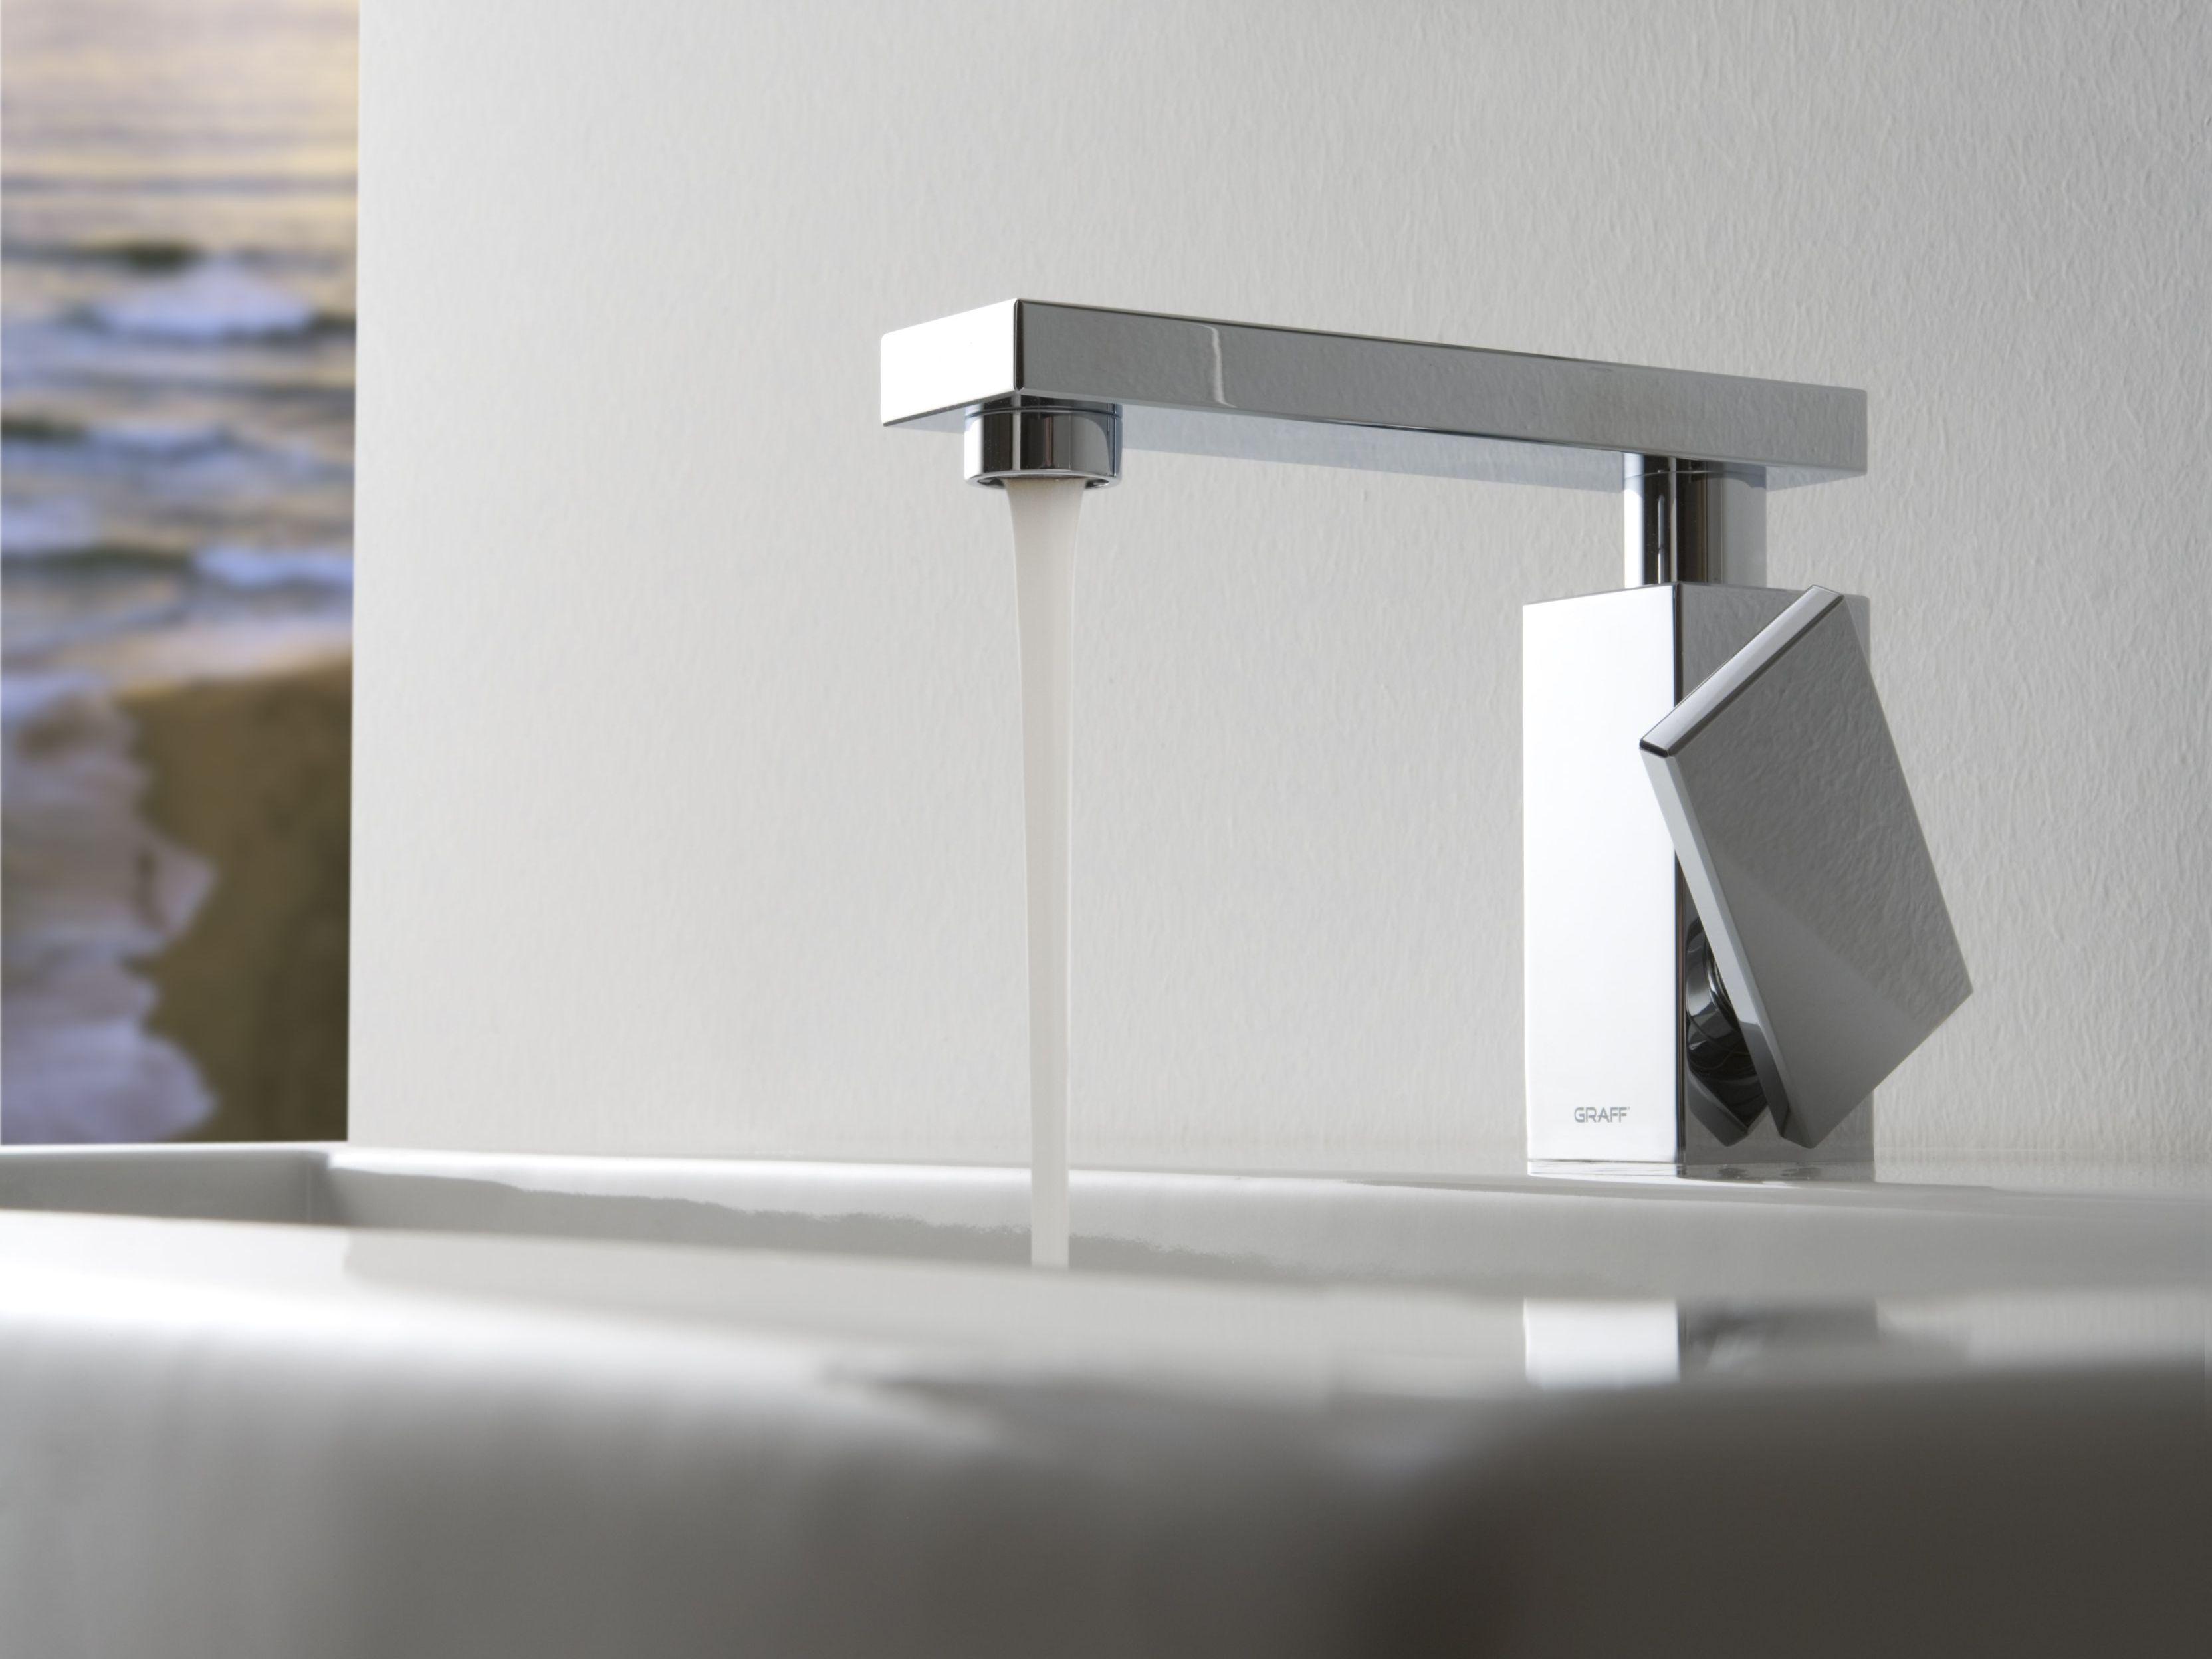 robinetterie douche grohe pas cher. Black Bedroom Furniture Sets. Home Design Ideas